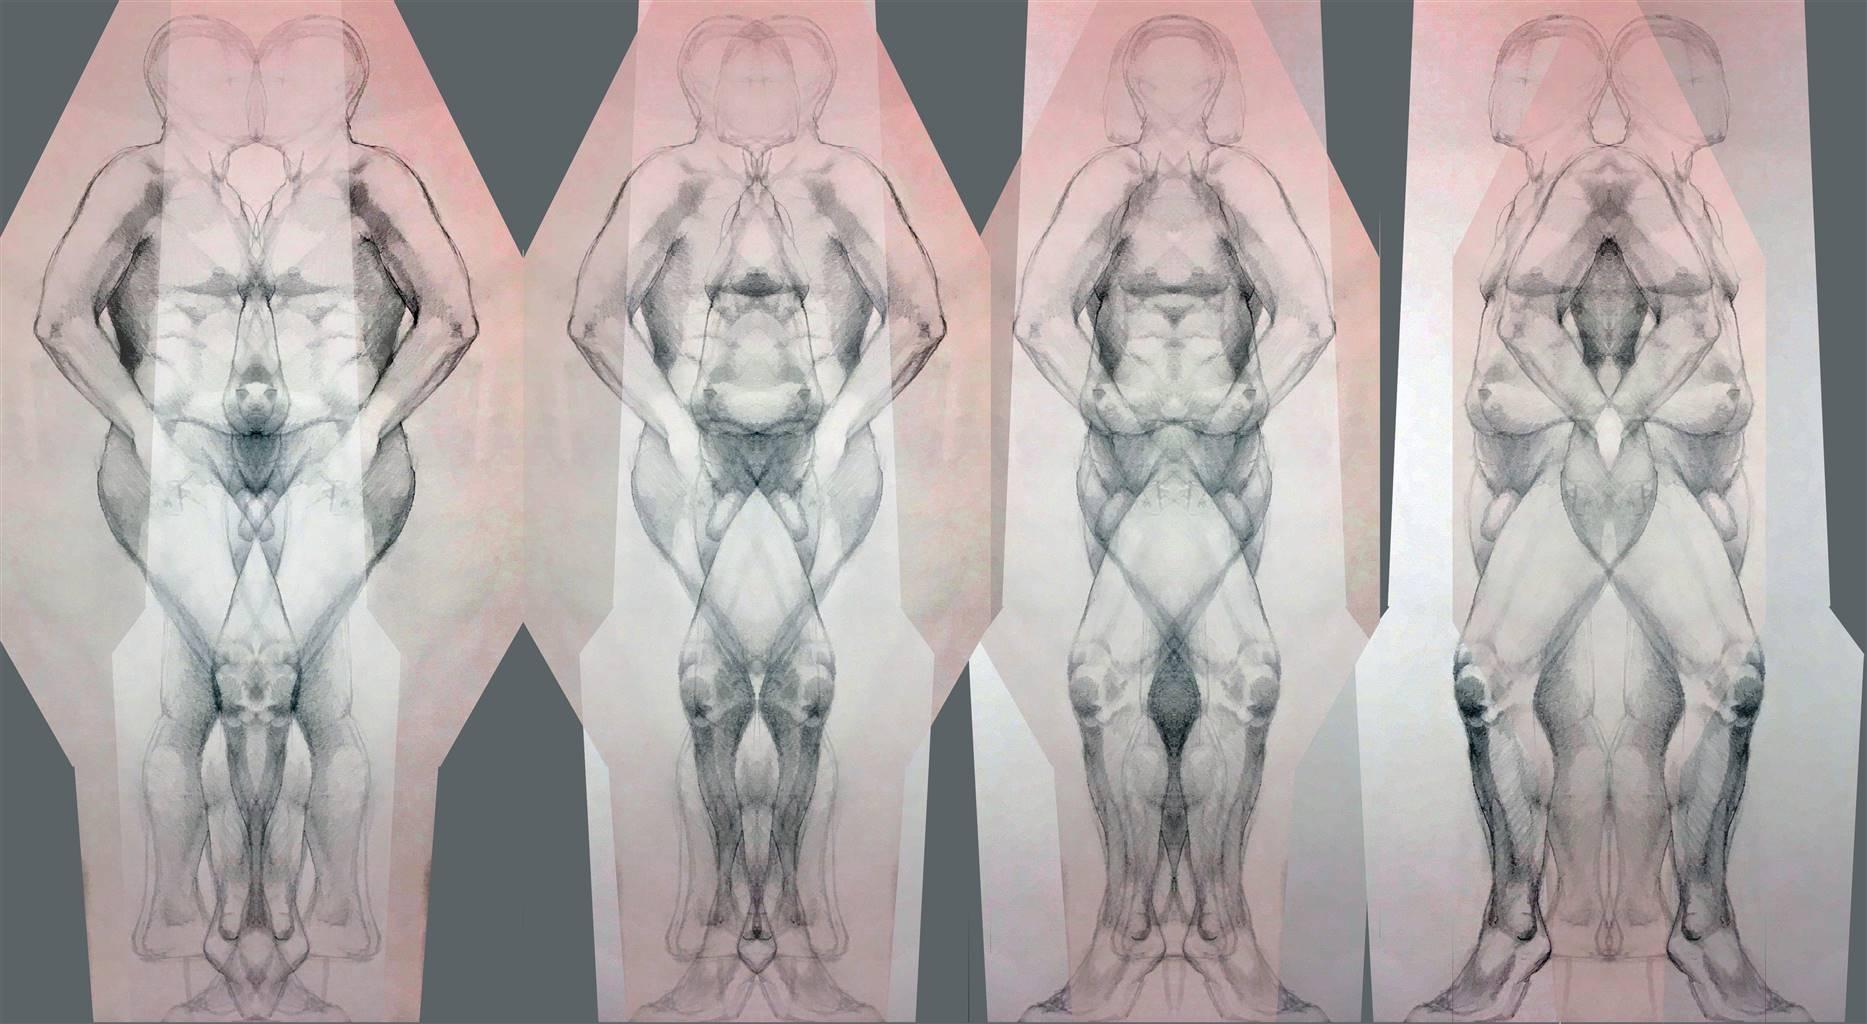 Stacey Dolen,Janus, Digital Print on Aluminum, 10'' x 18'' image